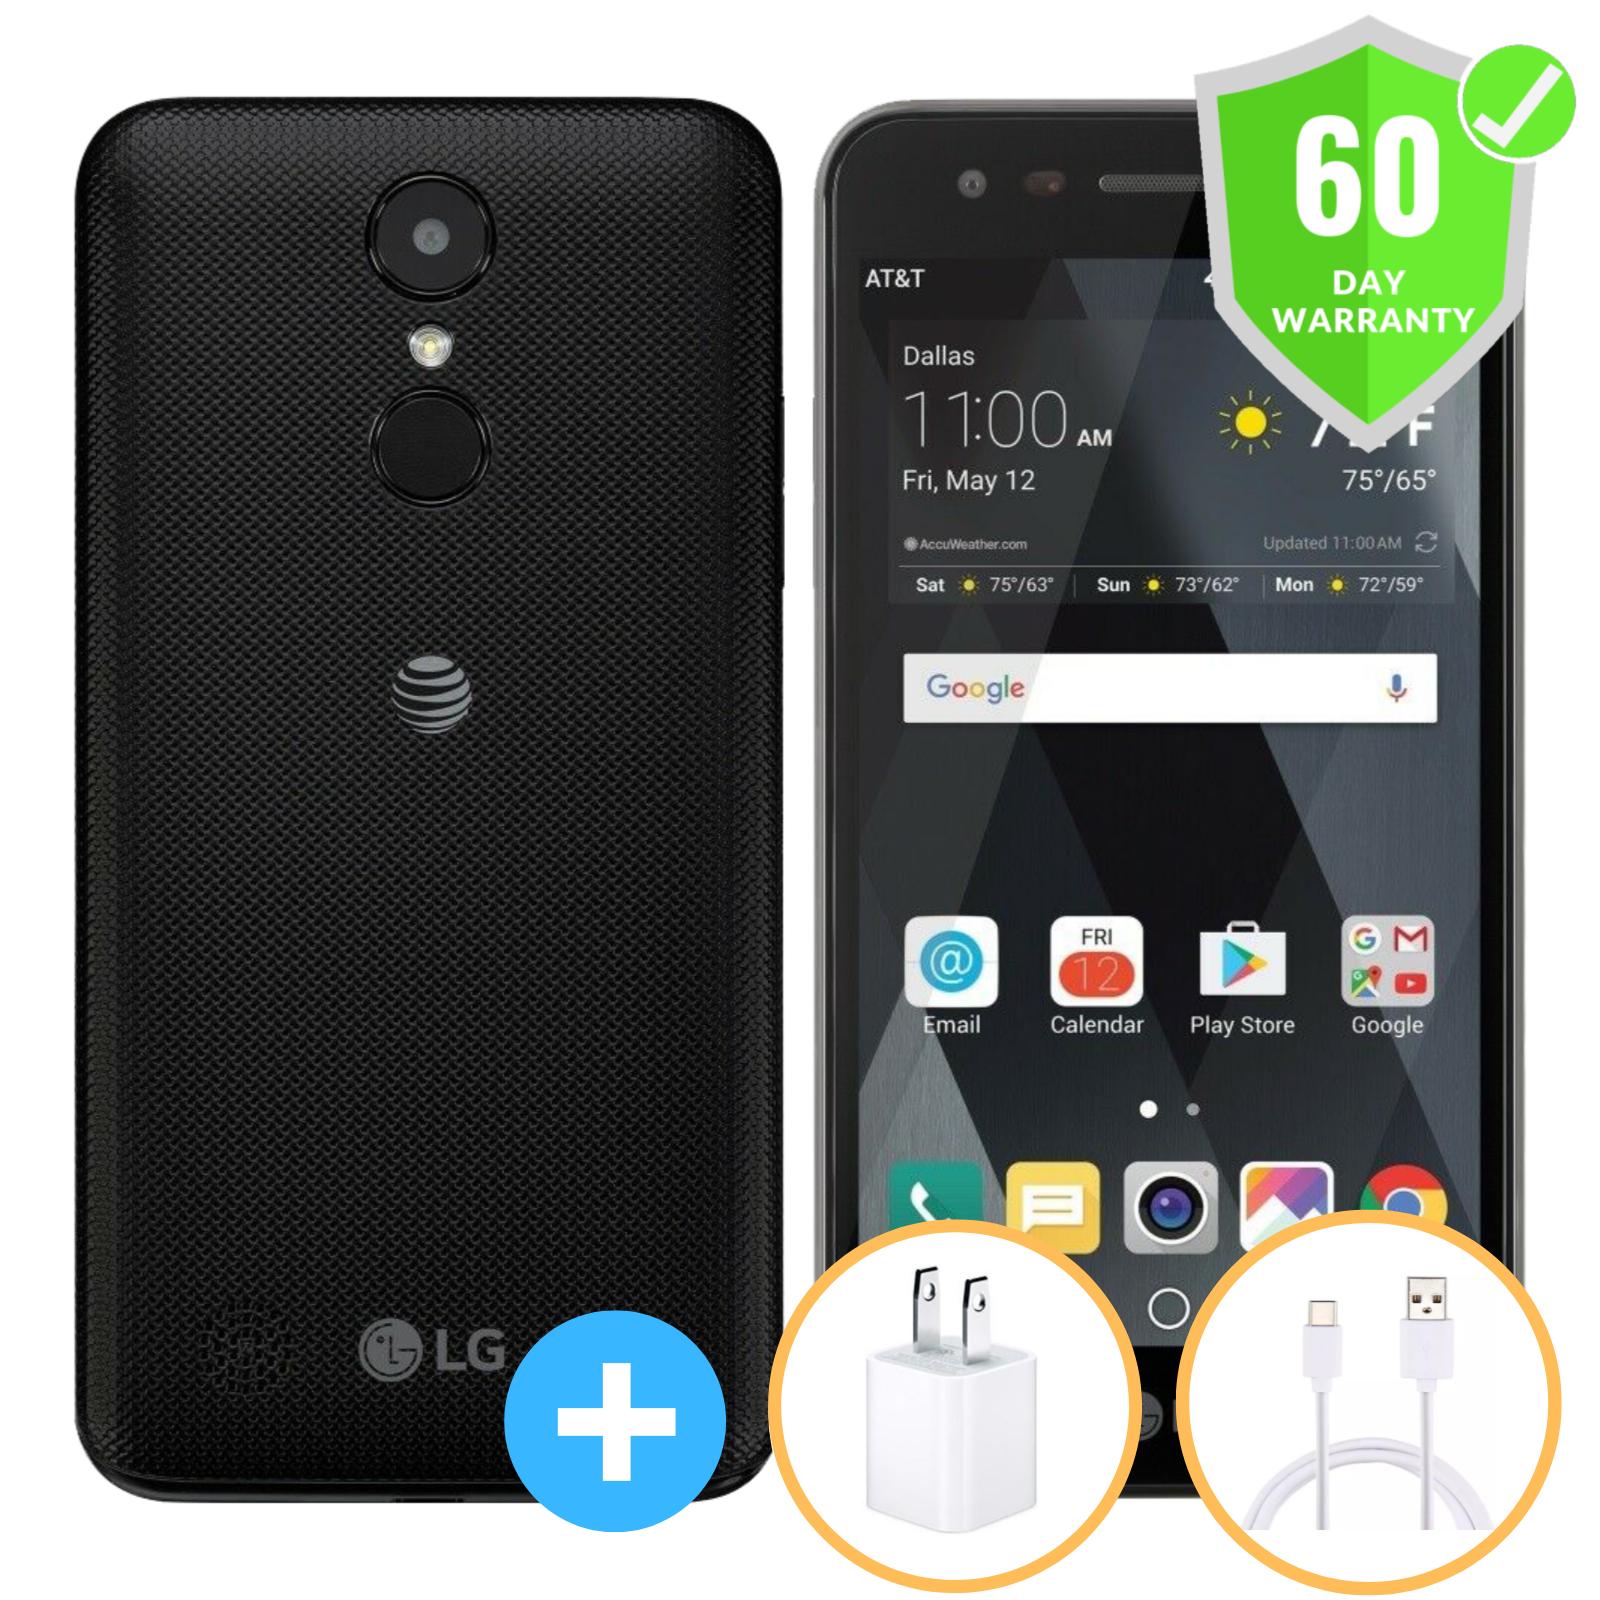 Android Phone - LG Phoenix 3 M150 - 16 GB - Black (Unlocked) Smartphone